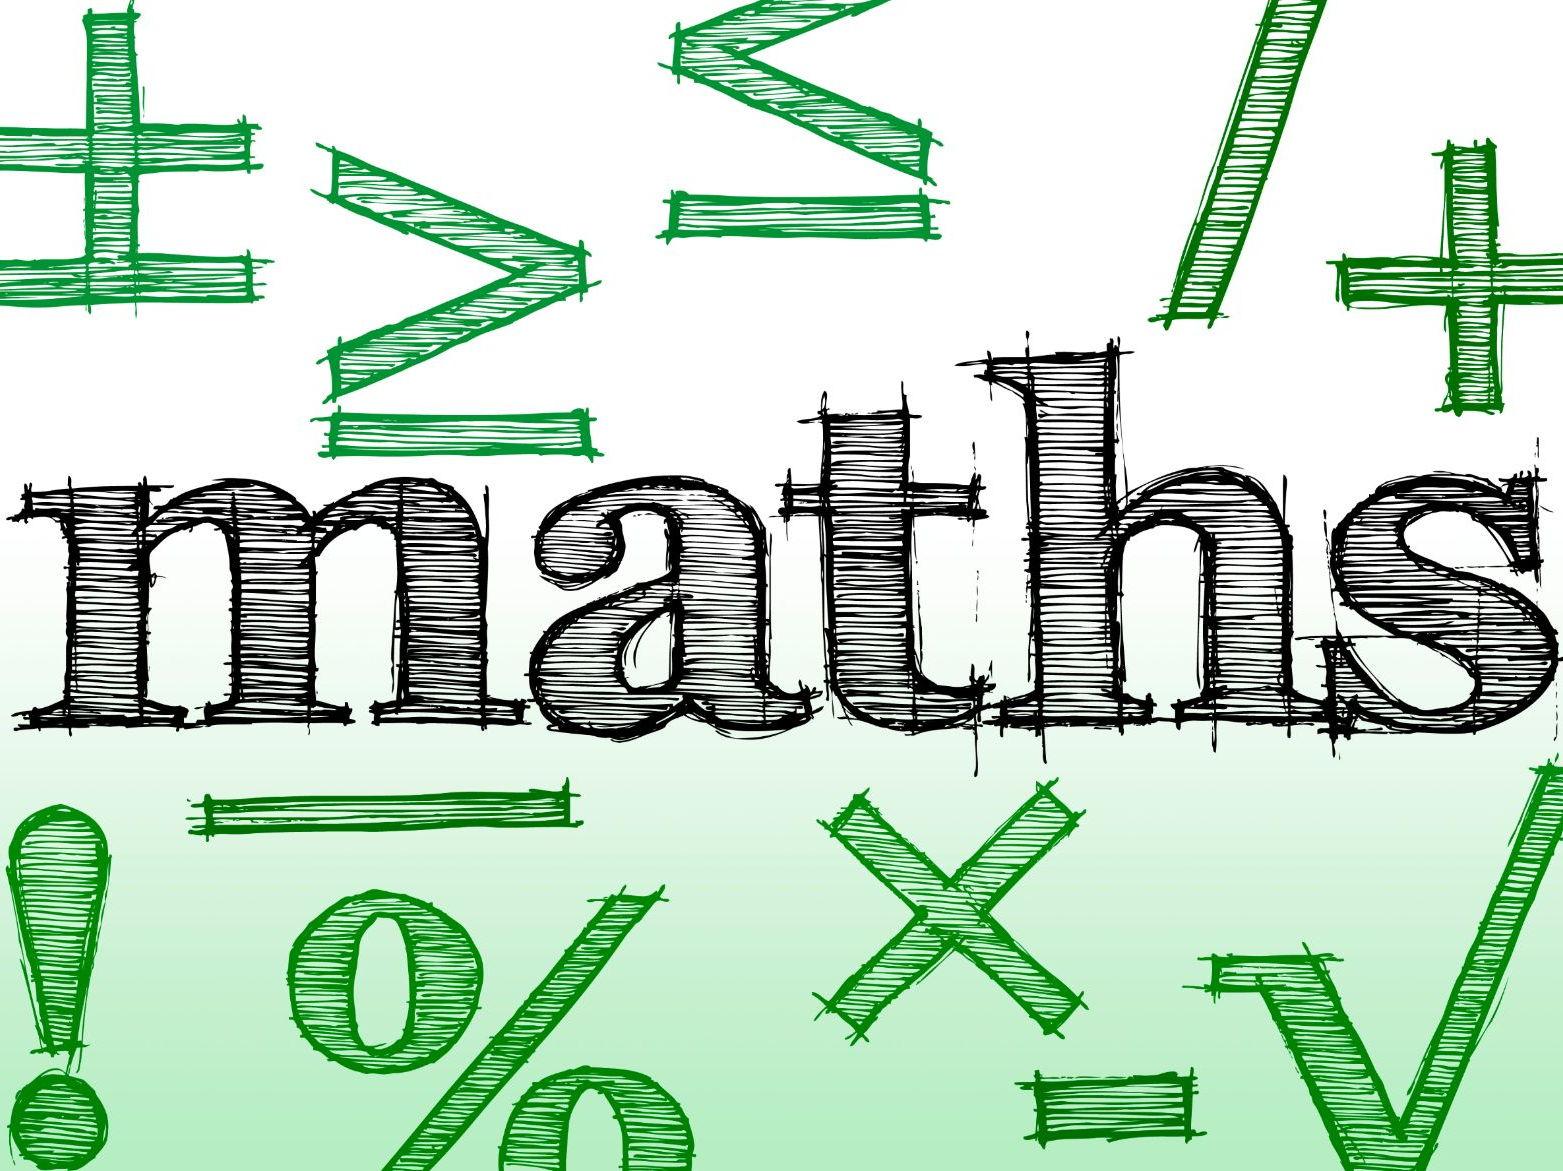 Times Table Multiplication Wheels (2x-12x)